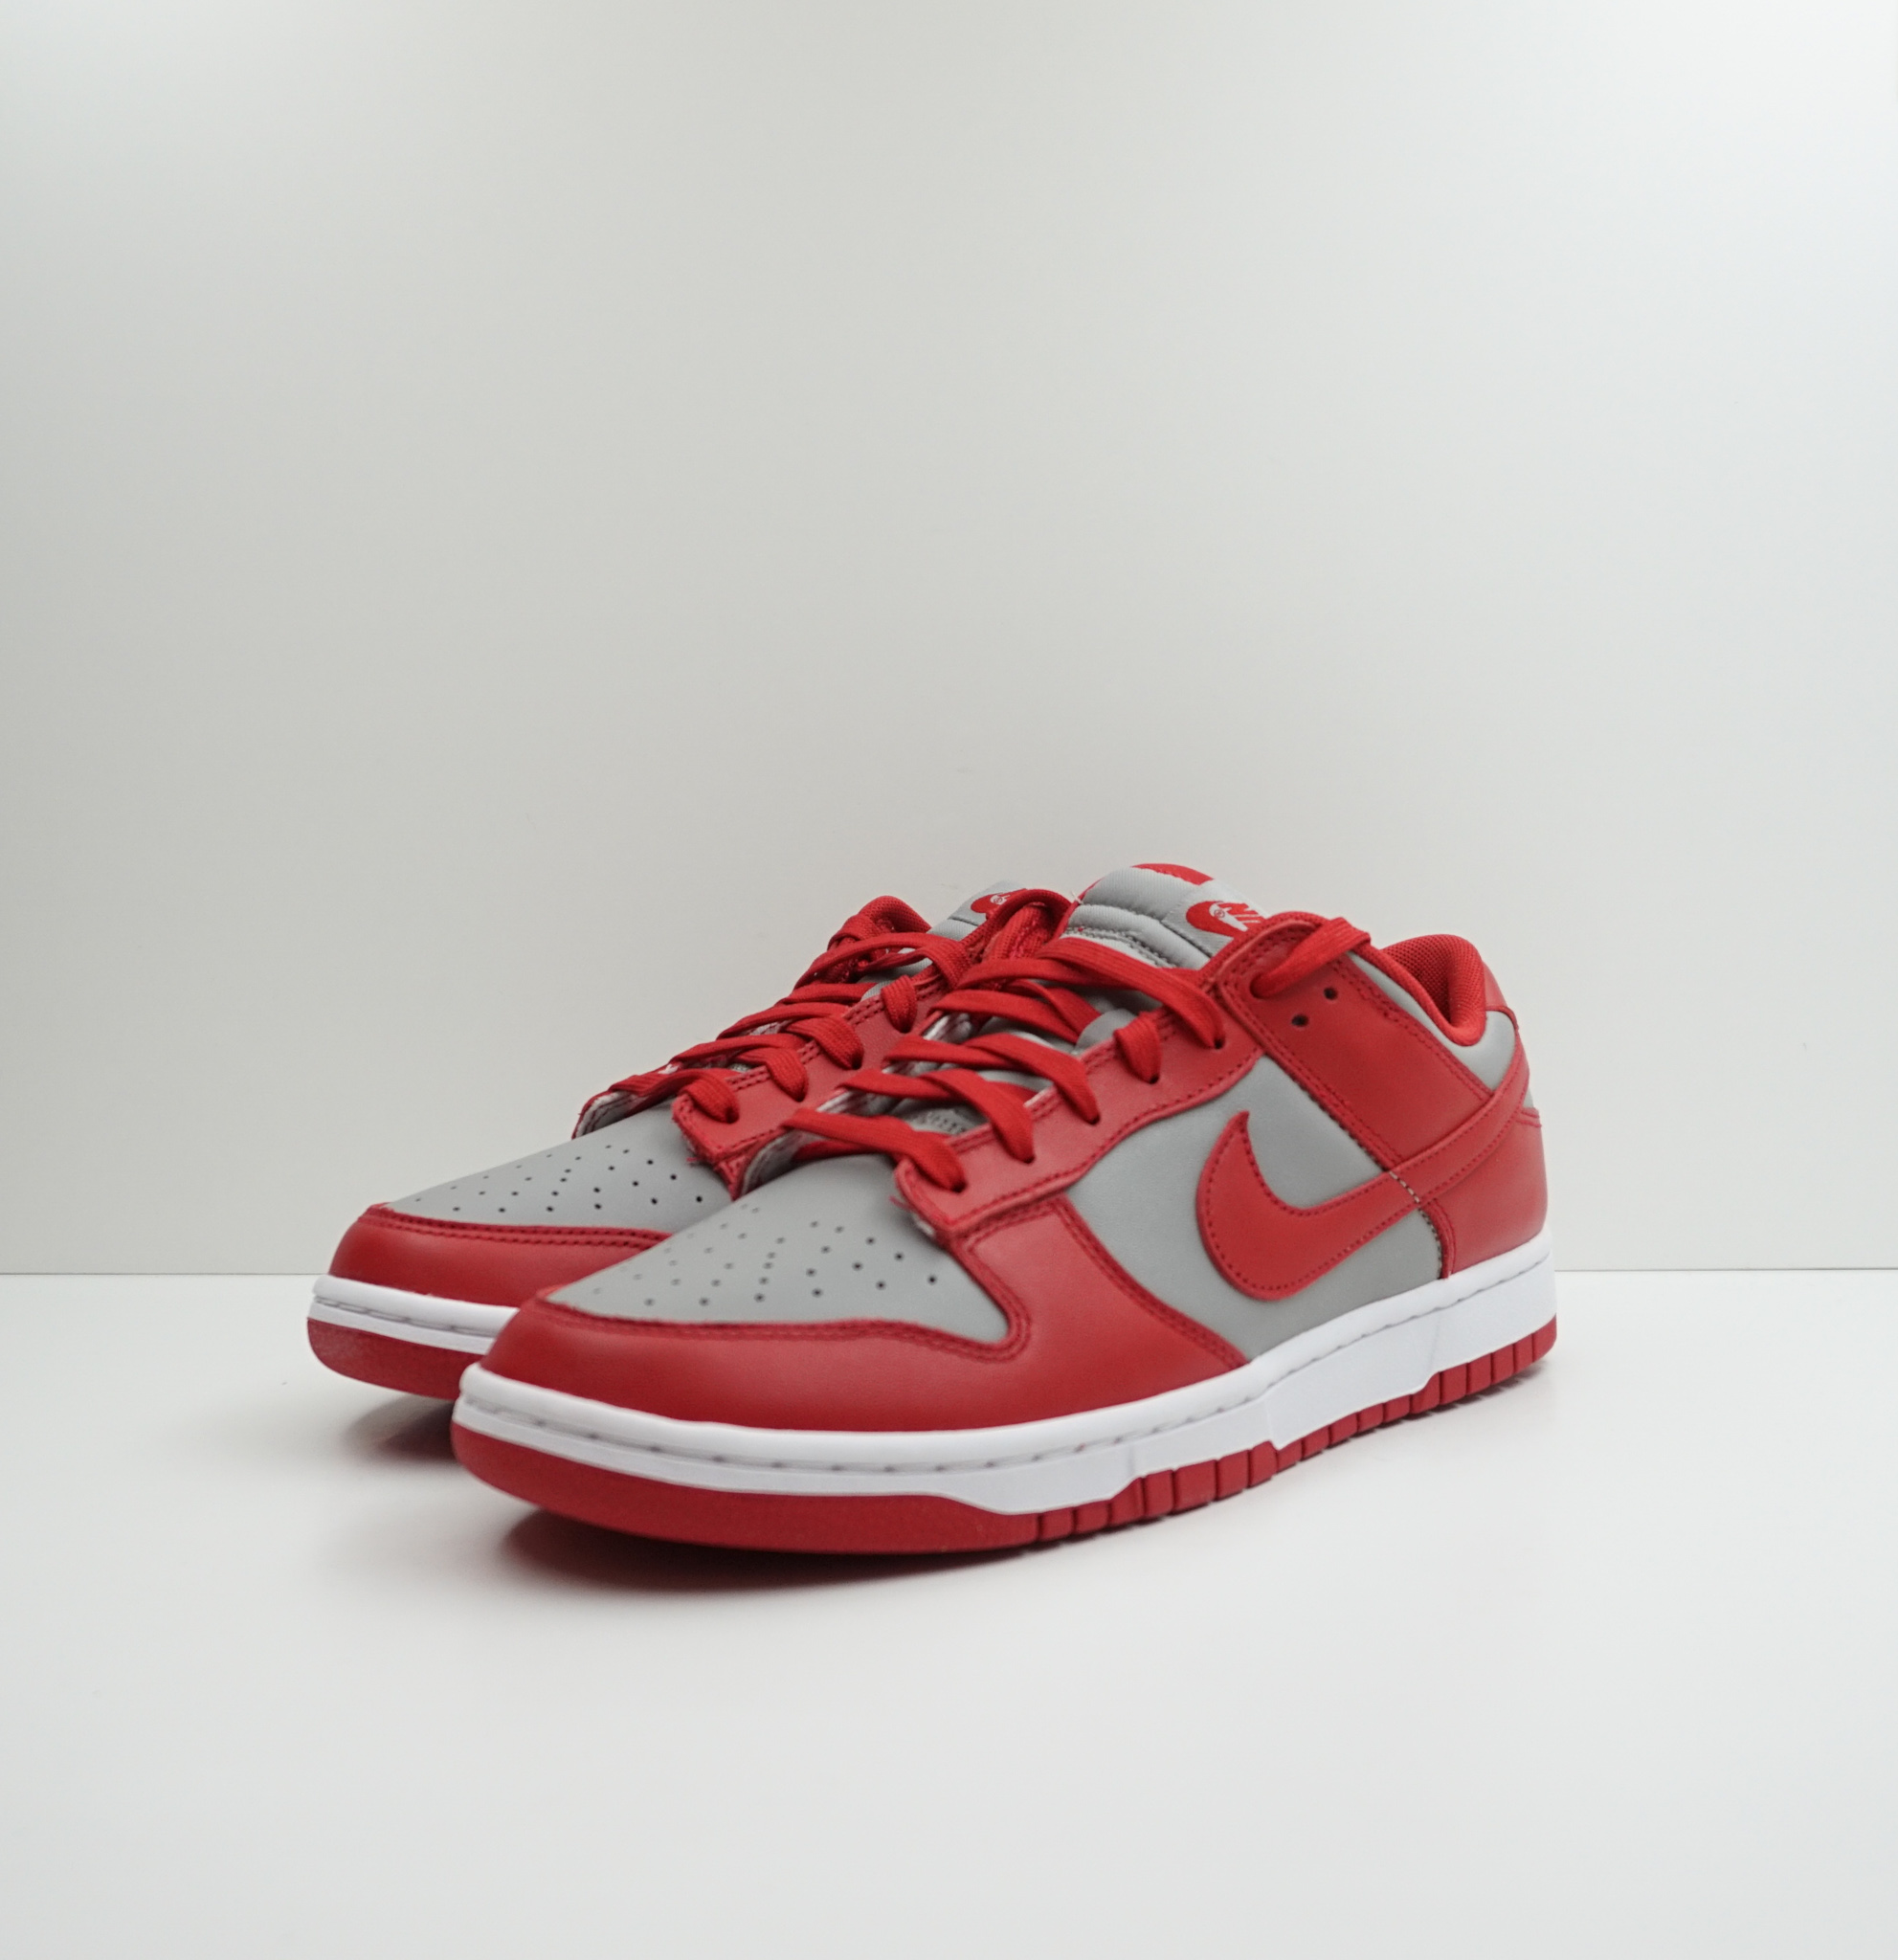 Nike Dunk Low Retro UNLV (2021)